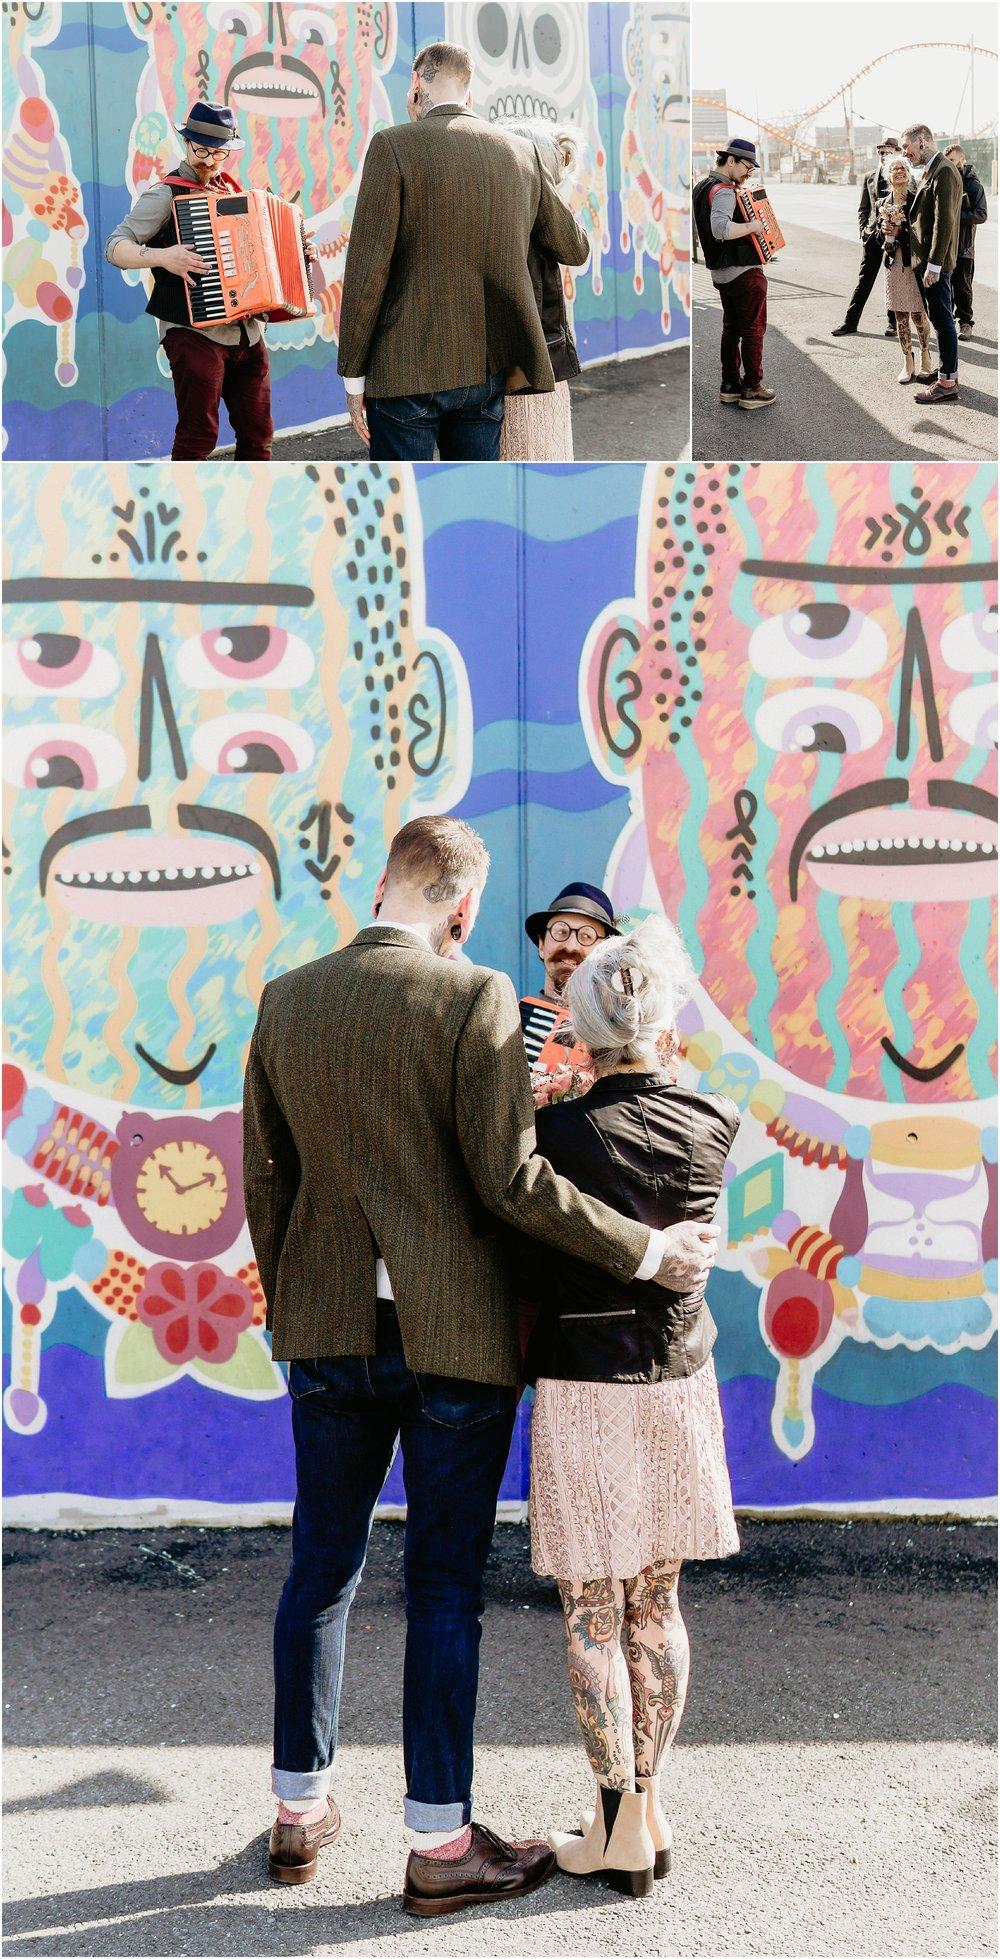 Lisa&Dan_Coney_Island_NYC_Elopement_Jeanette Joy Photography_April 2018_0031.jpg